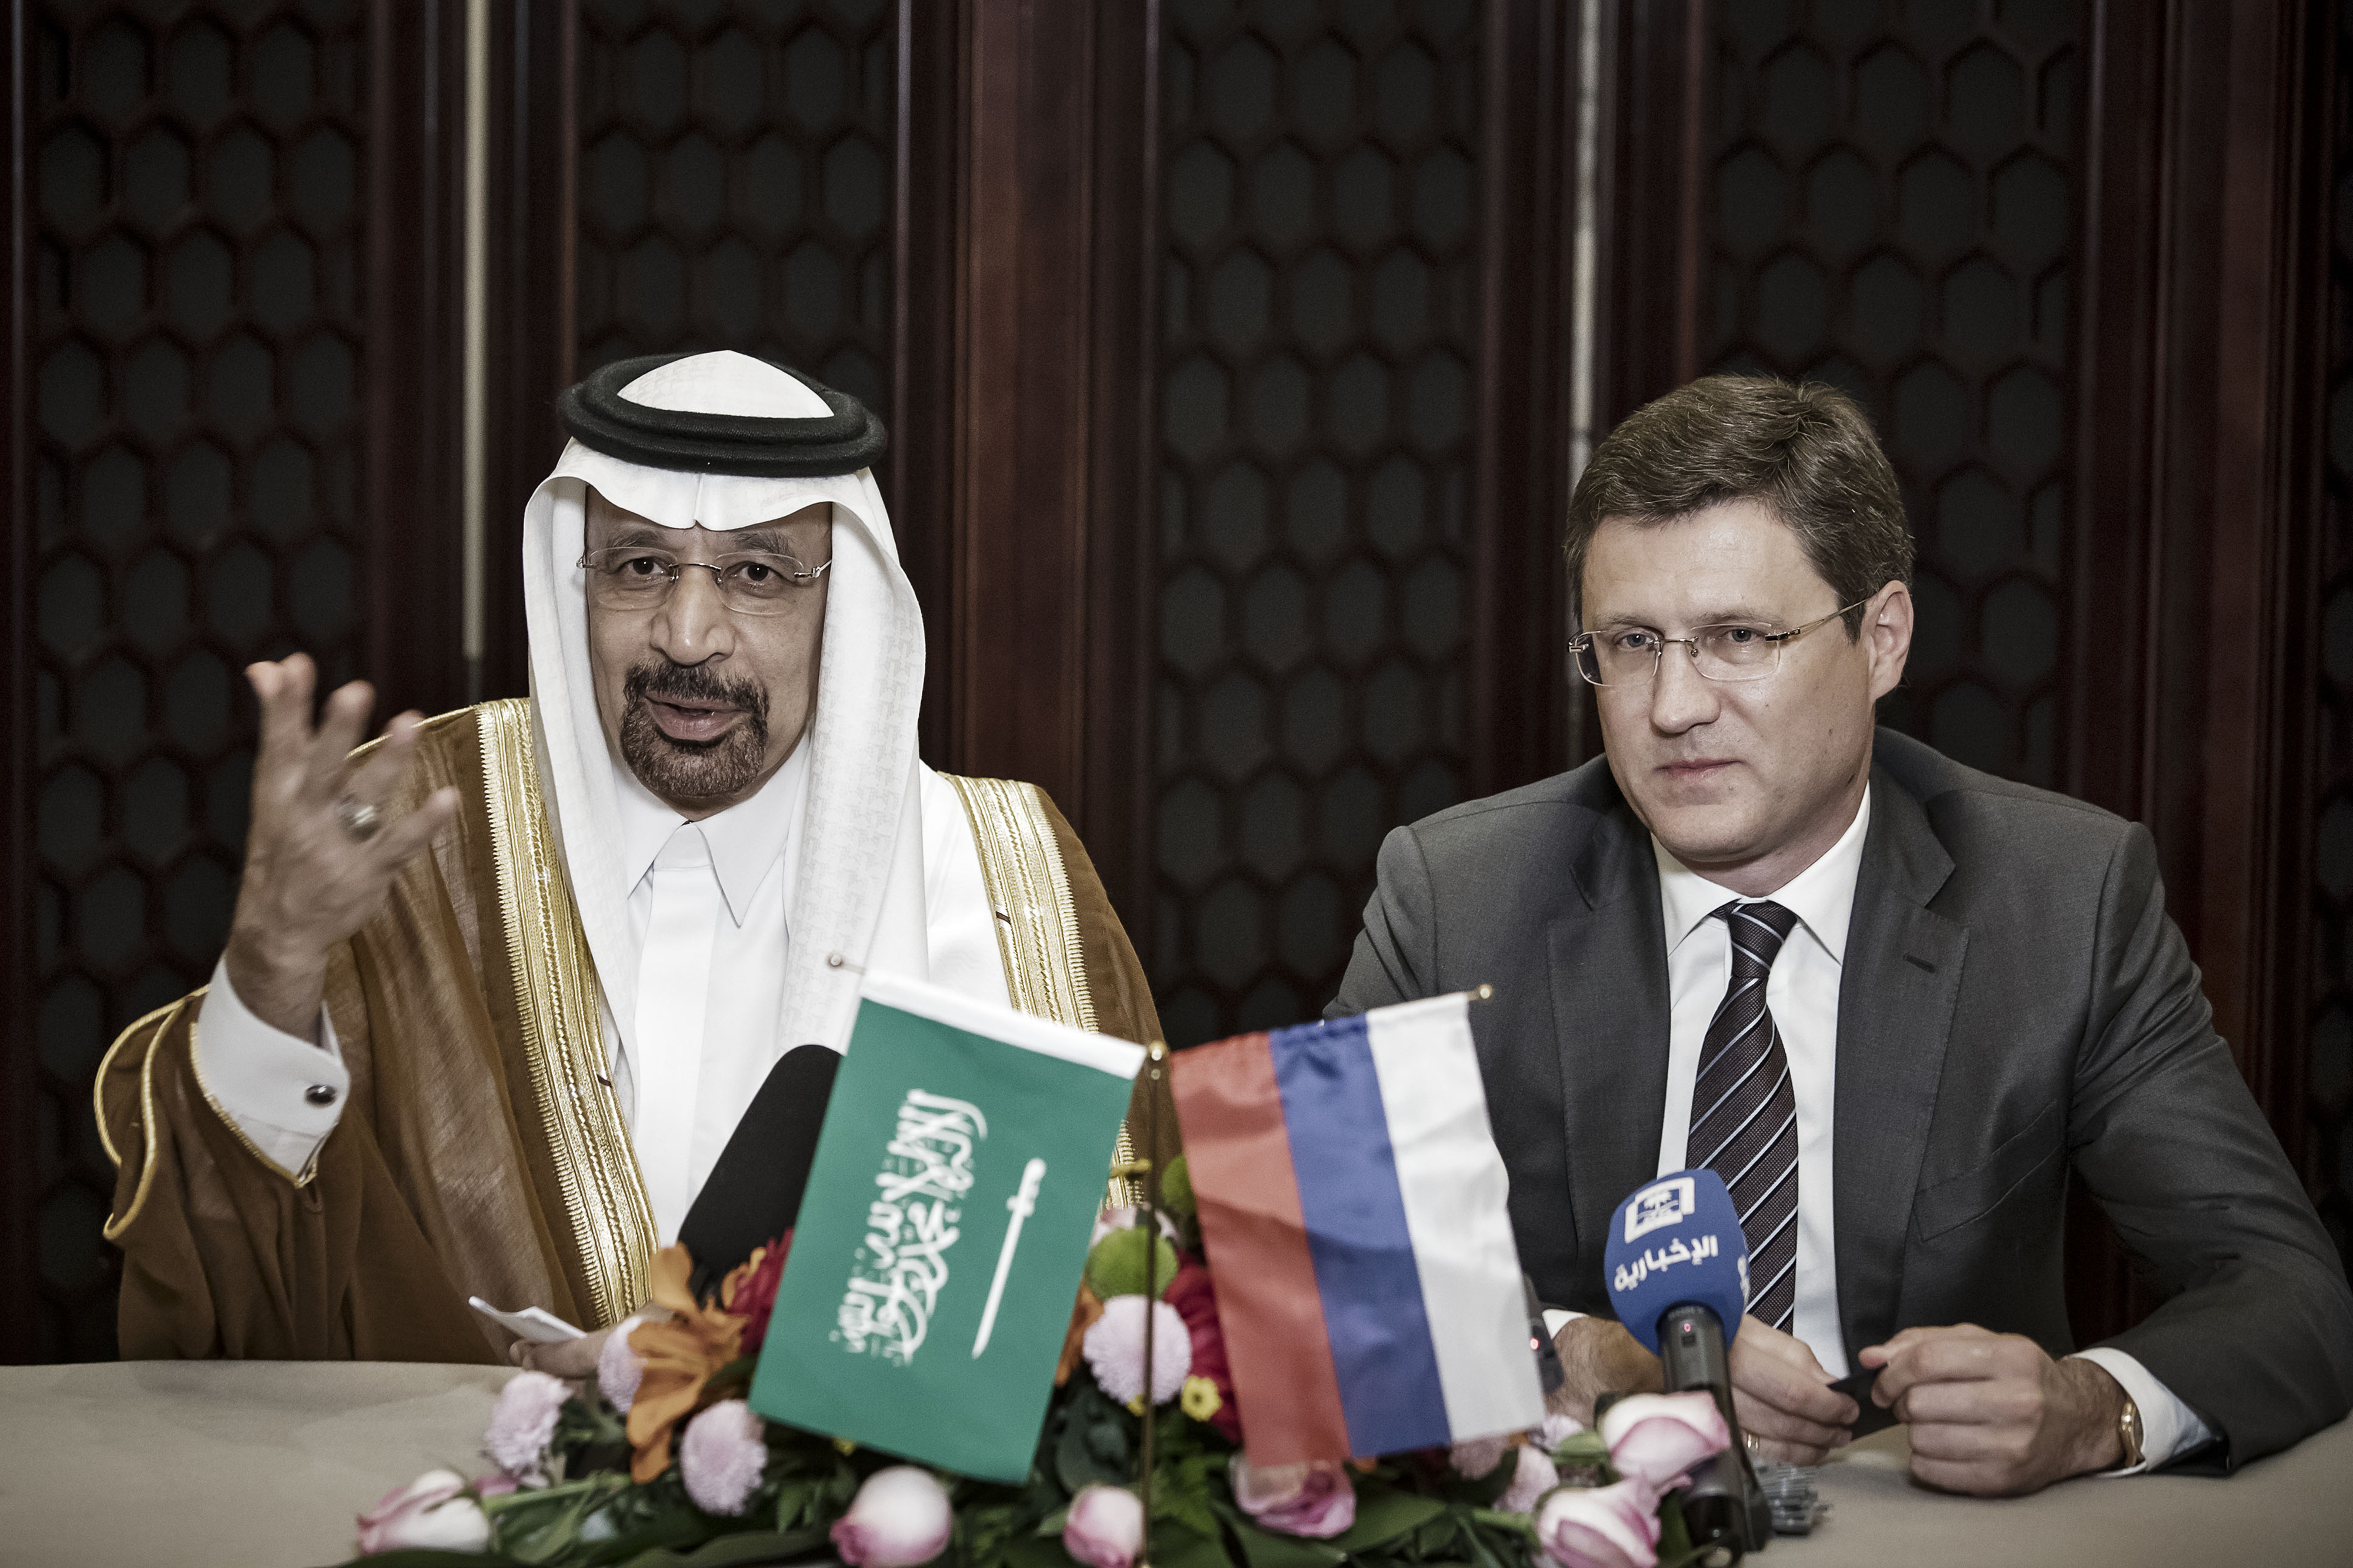 Saudi Arabia's Energy Minister Khalid Bin Abdulaziz Al-Falih And Russia's Energy Minister Alexander Novak News Conference